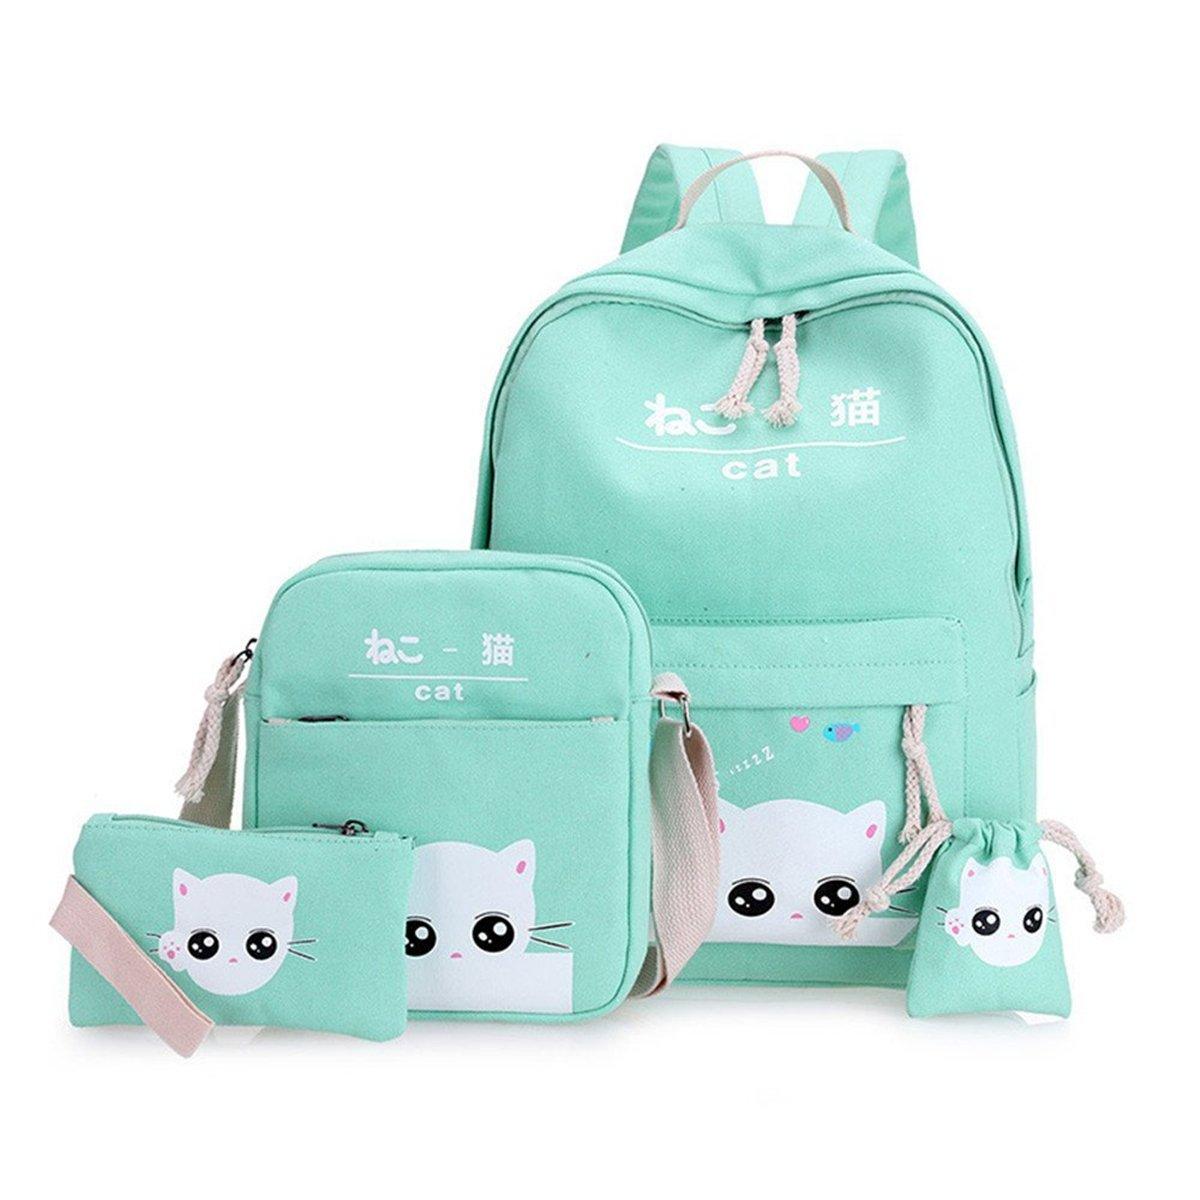 yqwel Teens学校バックパックセットキャンバスGirlsスクールバッグ、Bookbagsのセット4 B07F6C42R1 グリーン